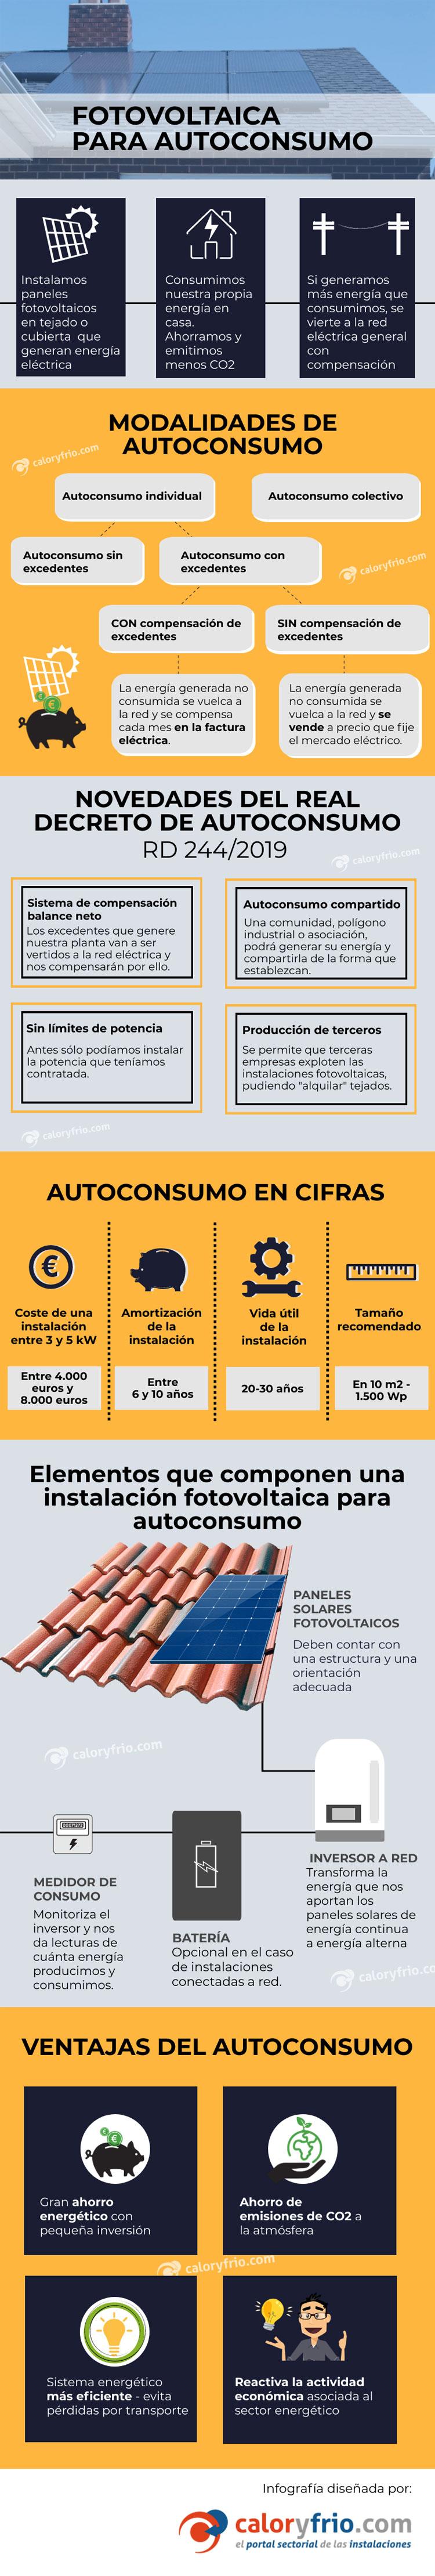 Infografía sobre autoconsumo solar fotovoltaico